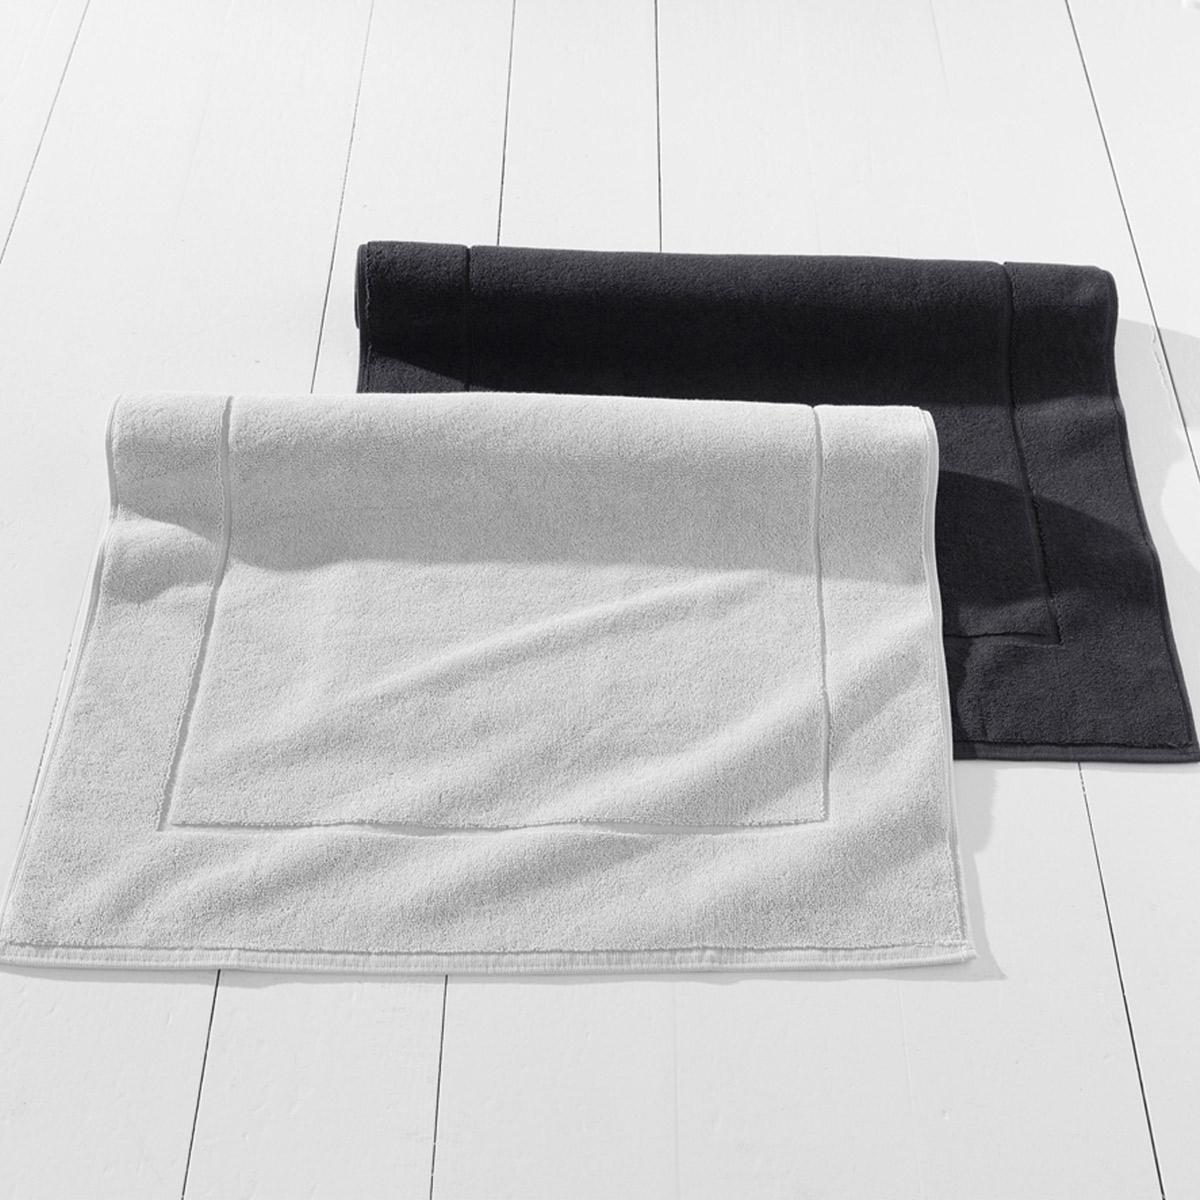 tapis de bain volute tradition des vosges. Black Bedroom Furniture Sets. Home Design Ideas